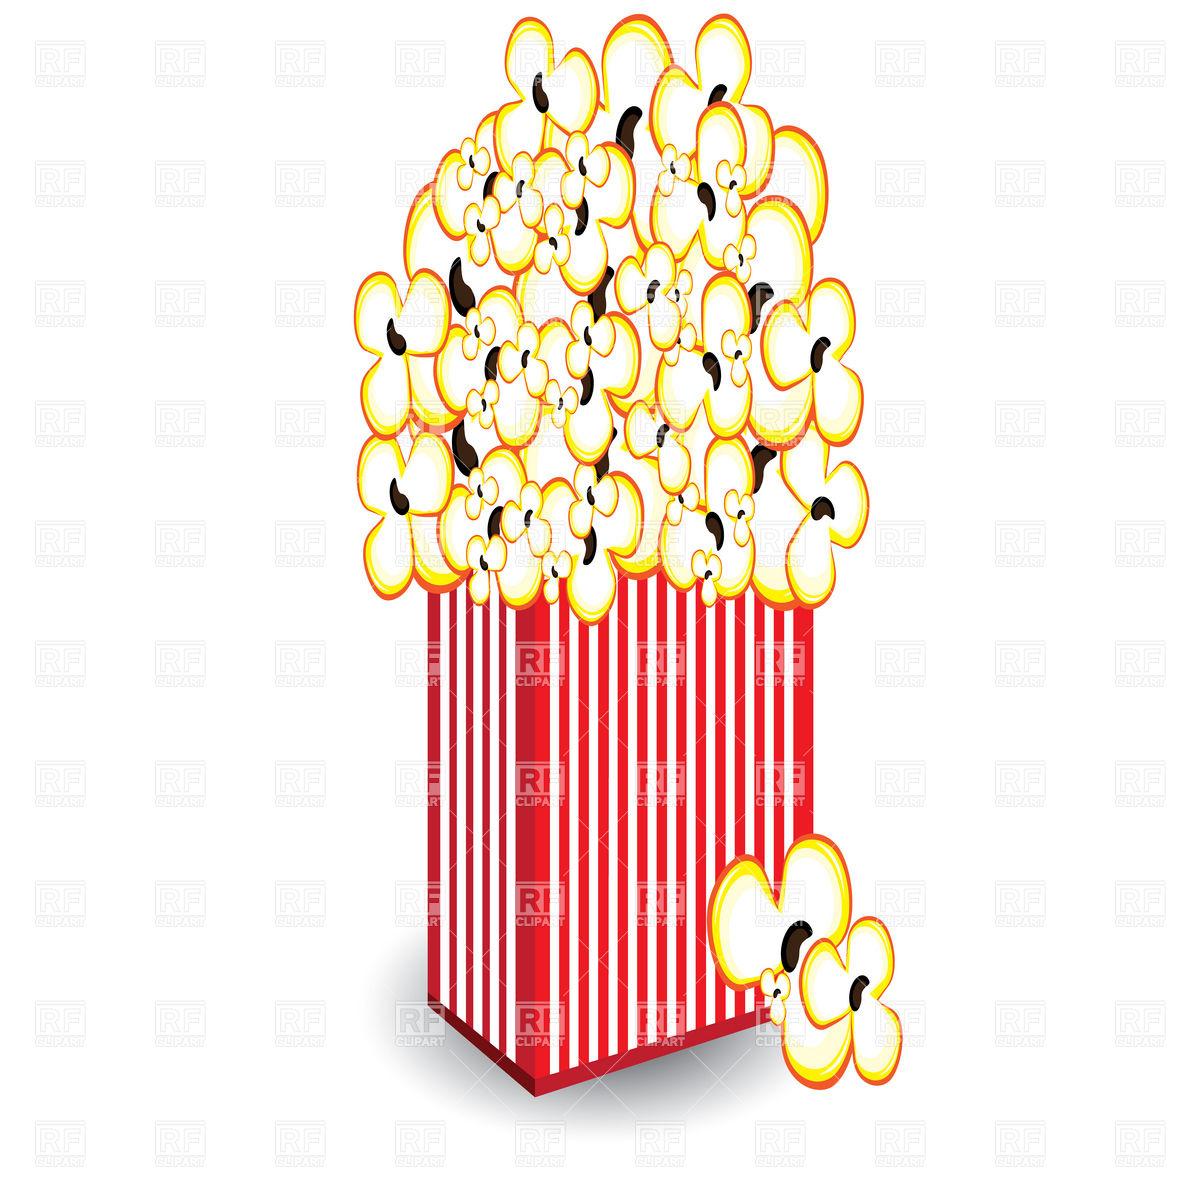 Popcorn Picture 2 Clipart - Clipart Kid